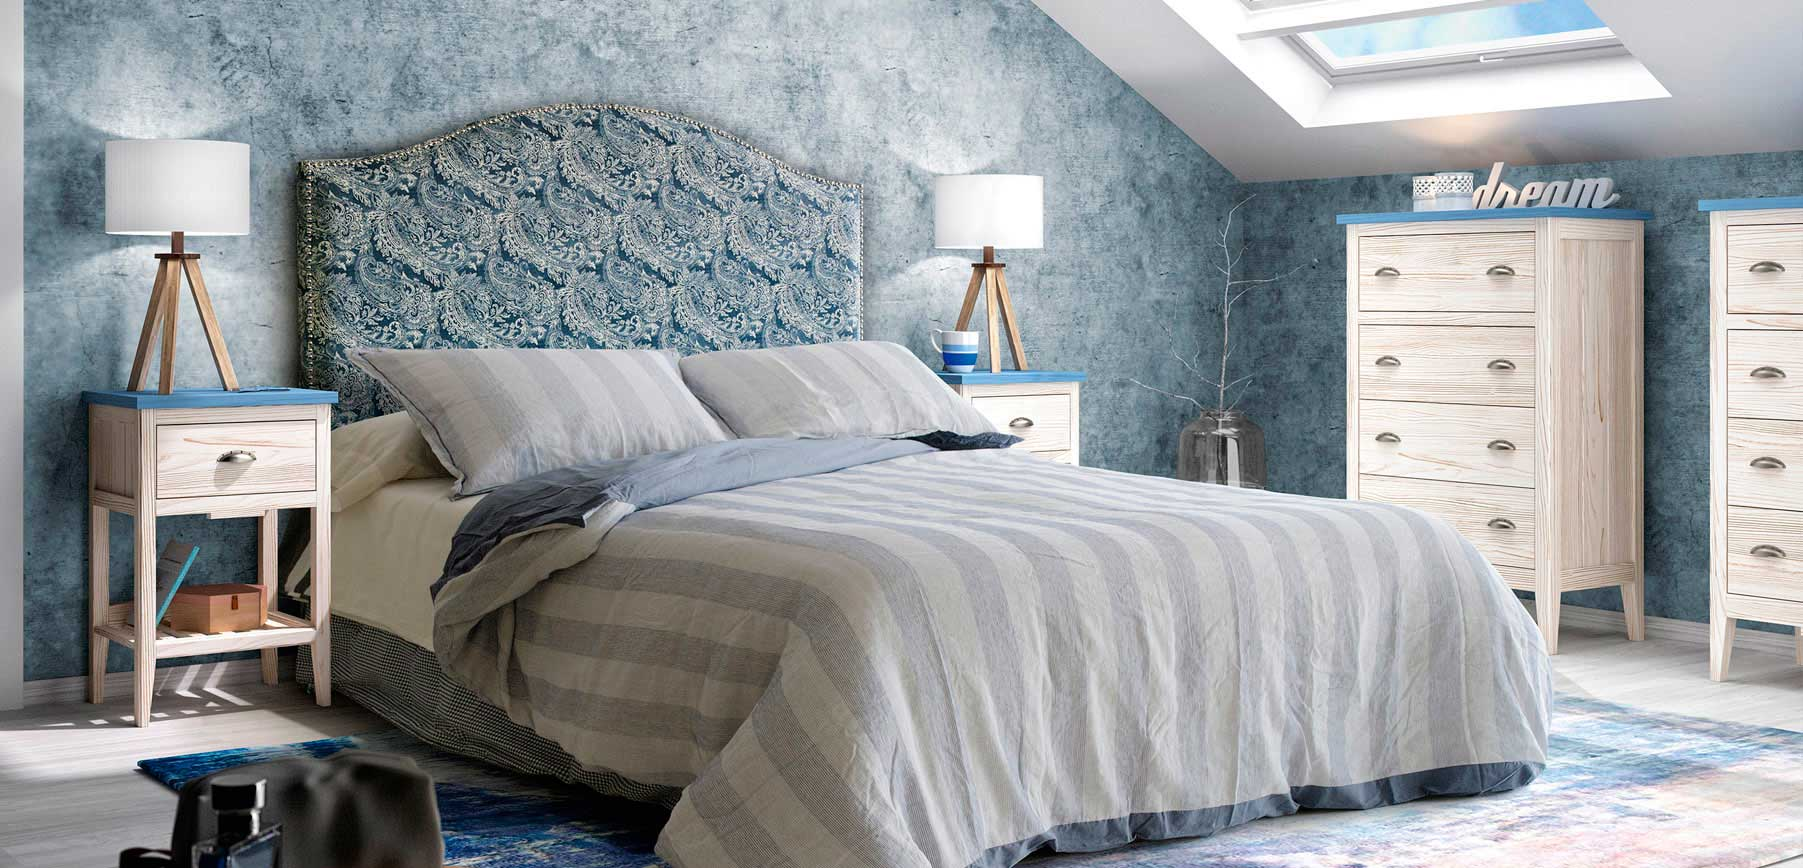 Muebles GRUPOSEYS - Muebles | Furniture | Meubles | мебель seys-4-optim Inicio